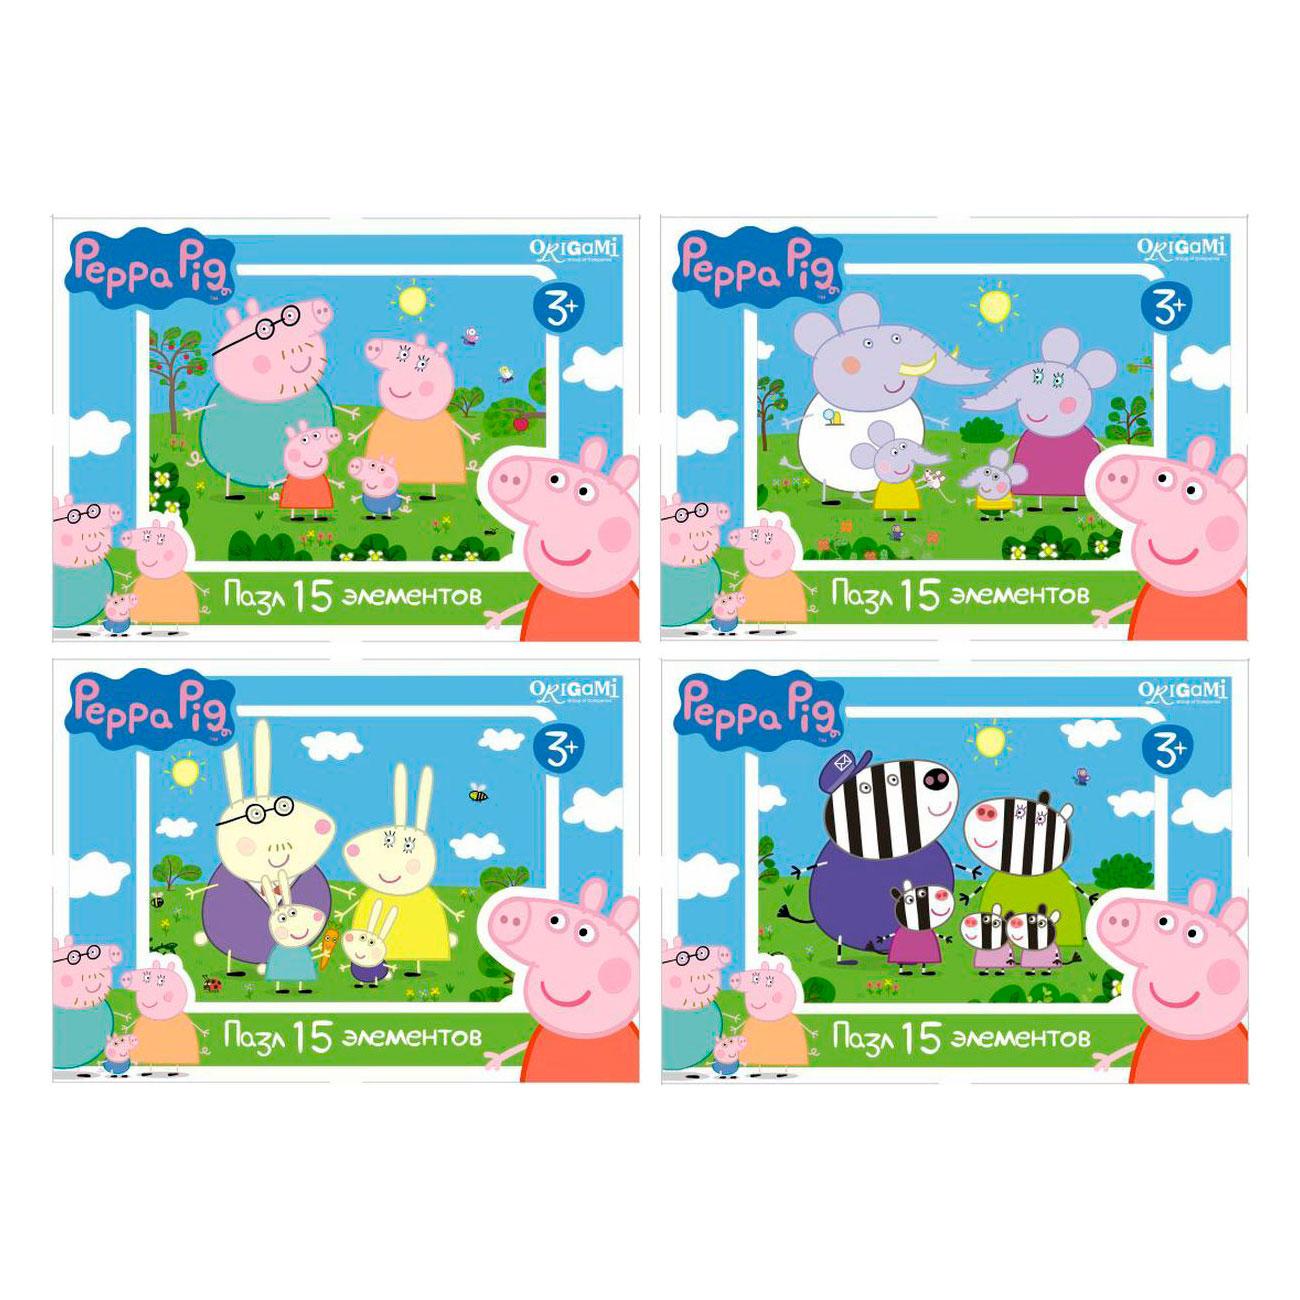 Пазл Origami Peppa Pig 1593<br>